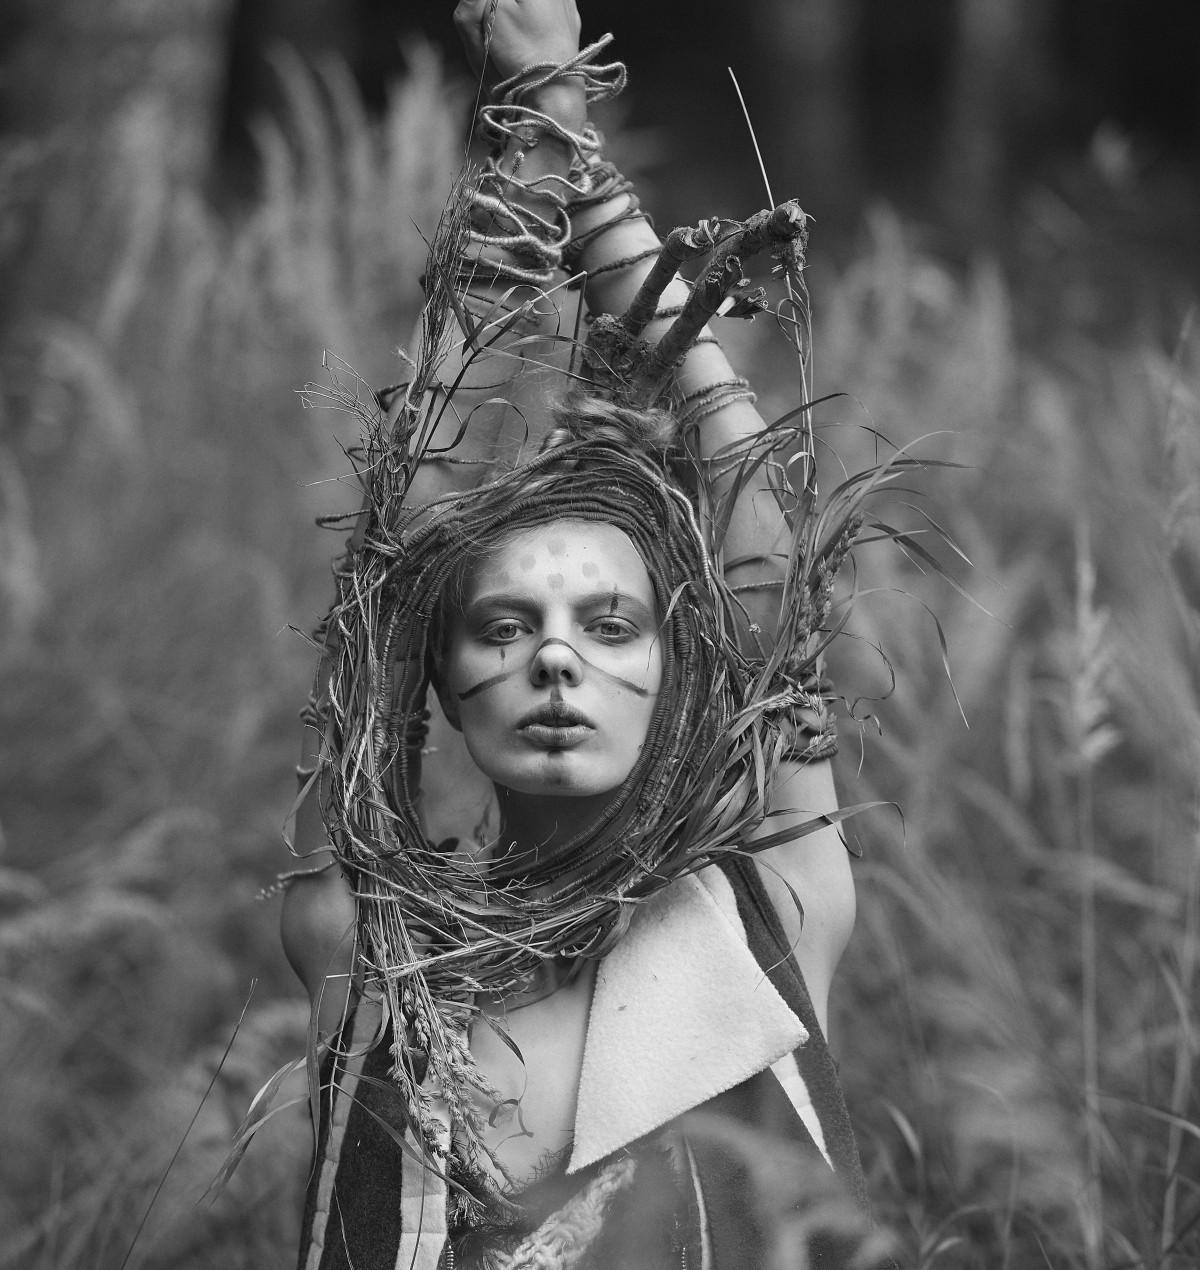 photo Vladimir Lyovin, style Evgenia Lyovina, floral designer Elene Laidinen, designer Masha Mamonova, model Darina Pilina, august 2015, Pavlovsk